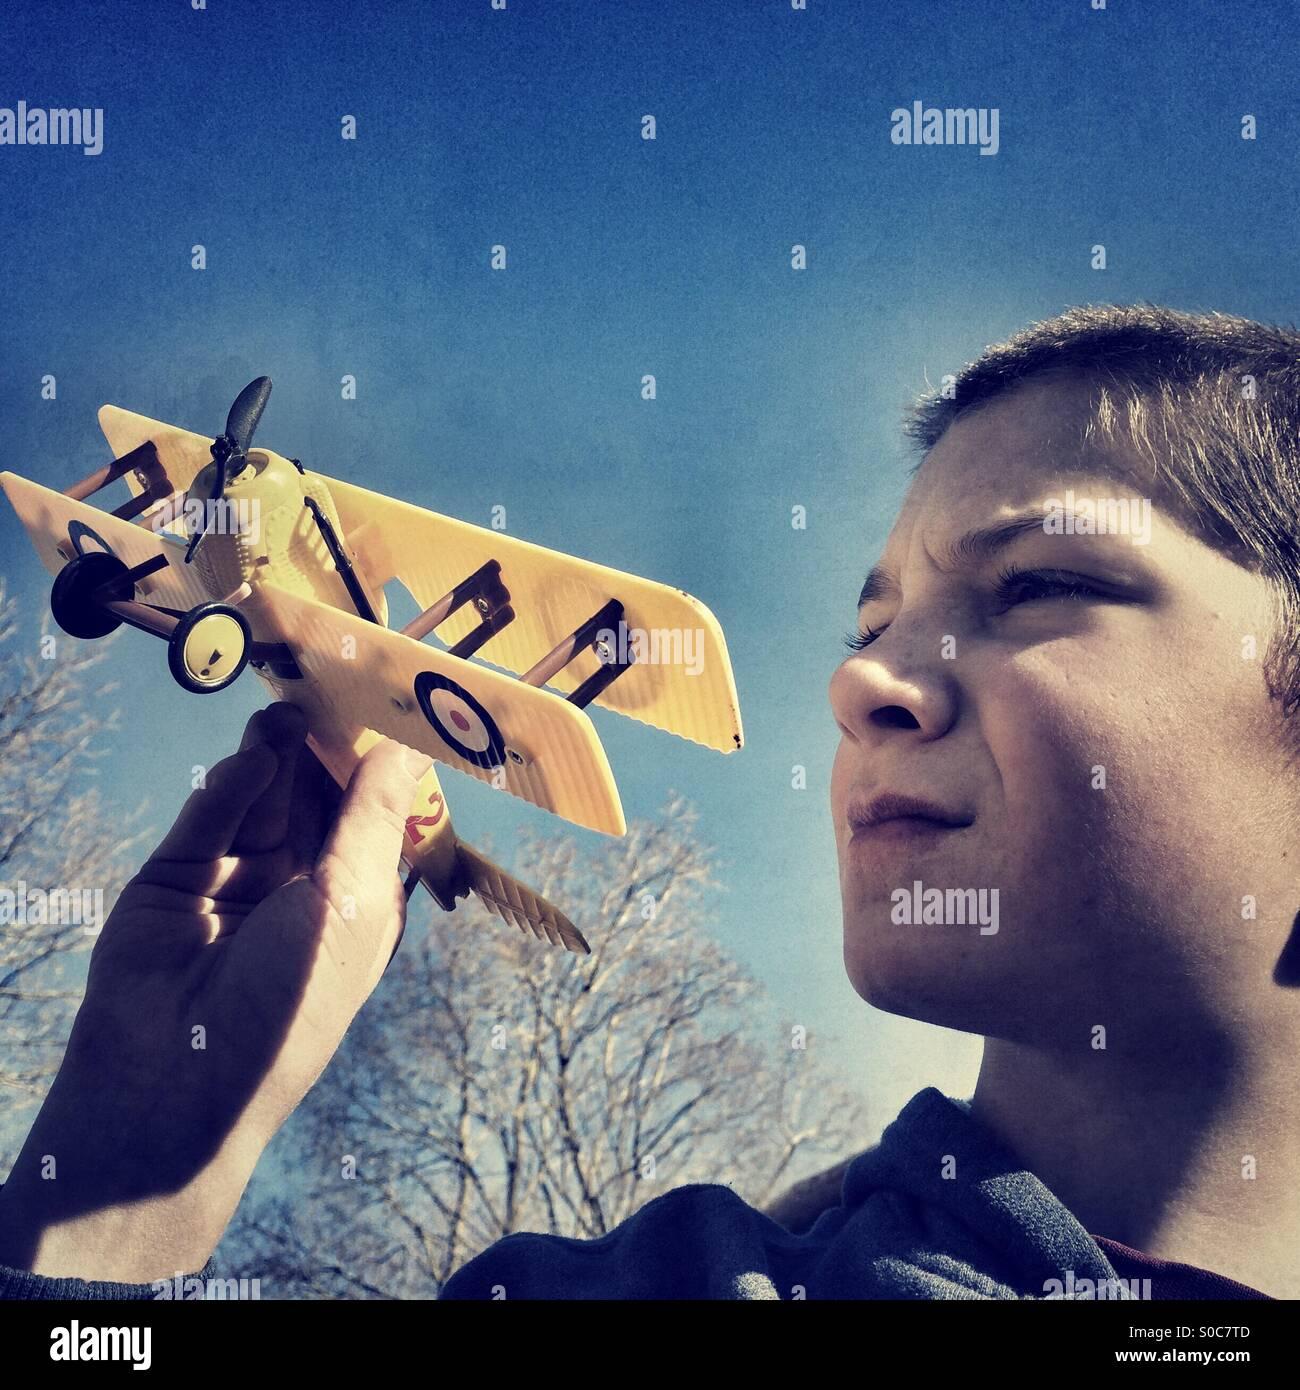 Niño volando su modelo de biplano Imagen De Stock